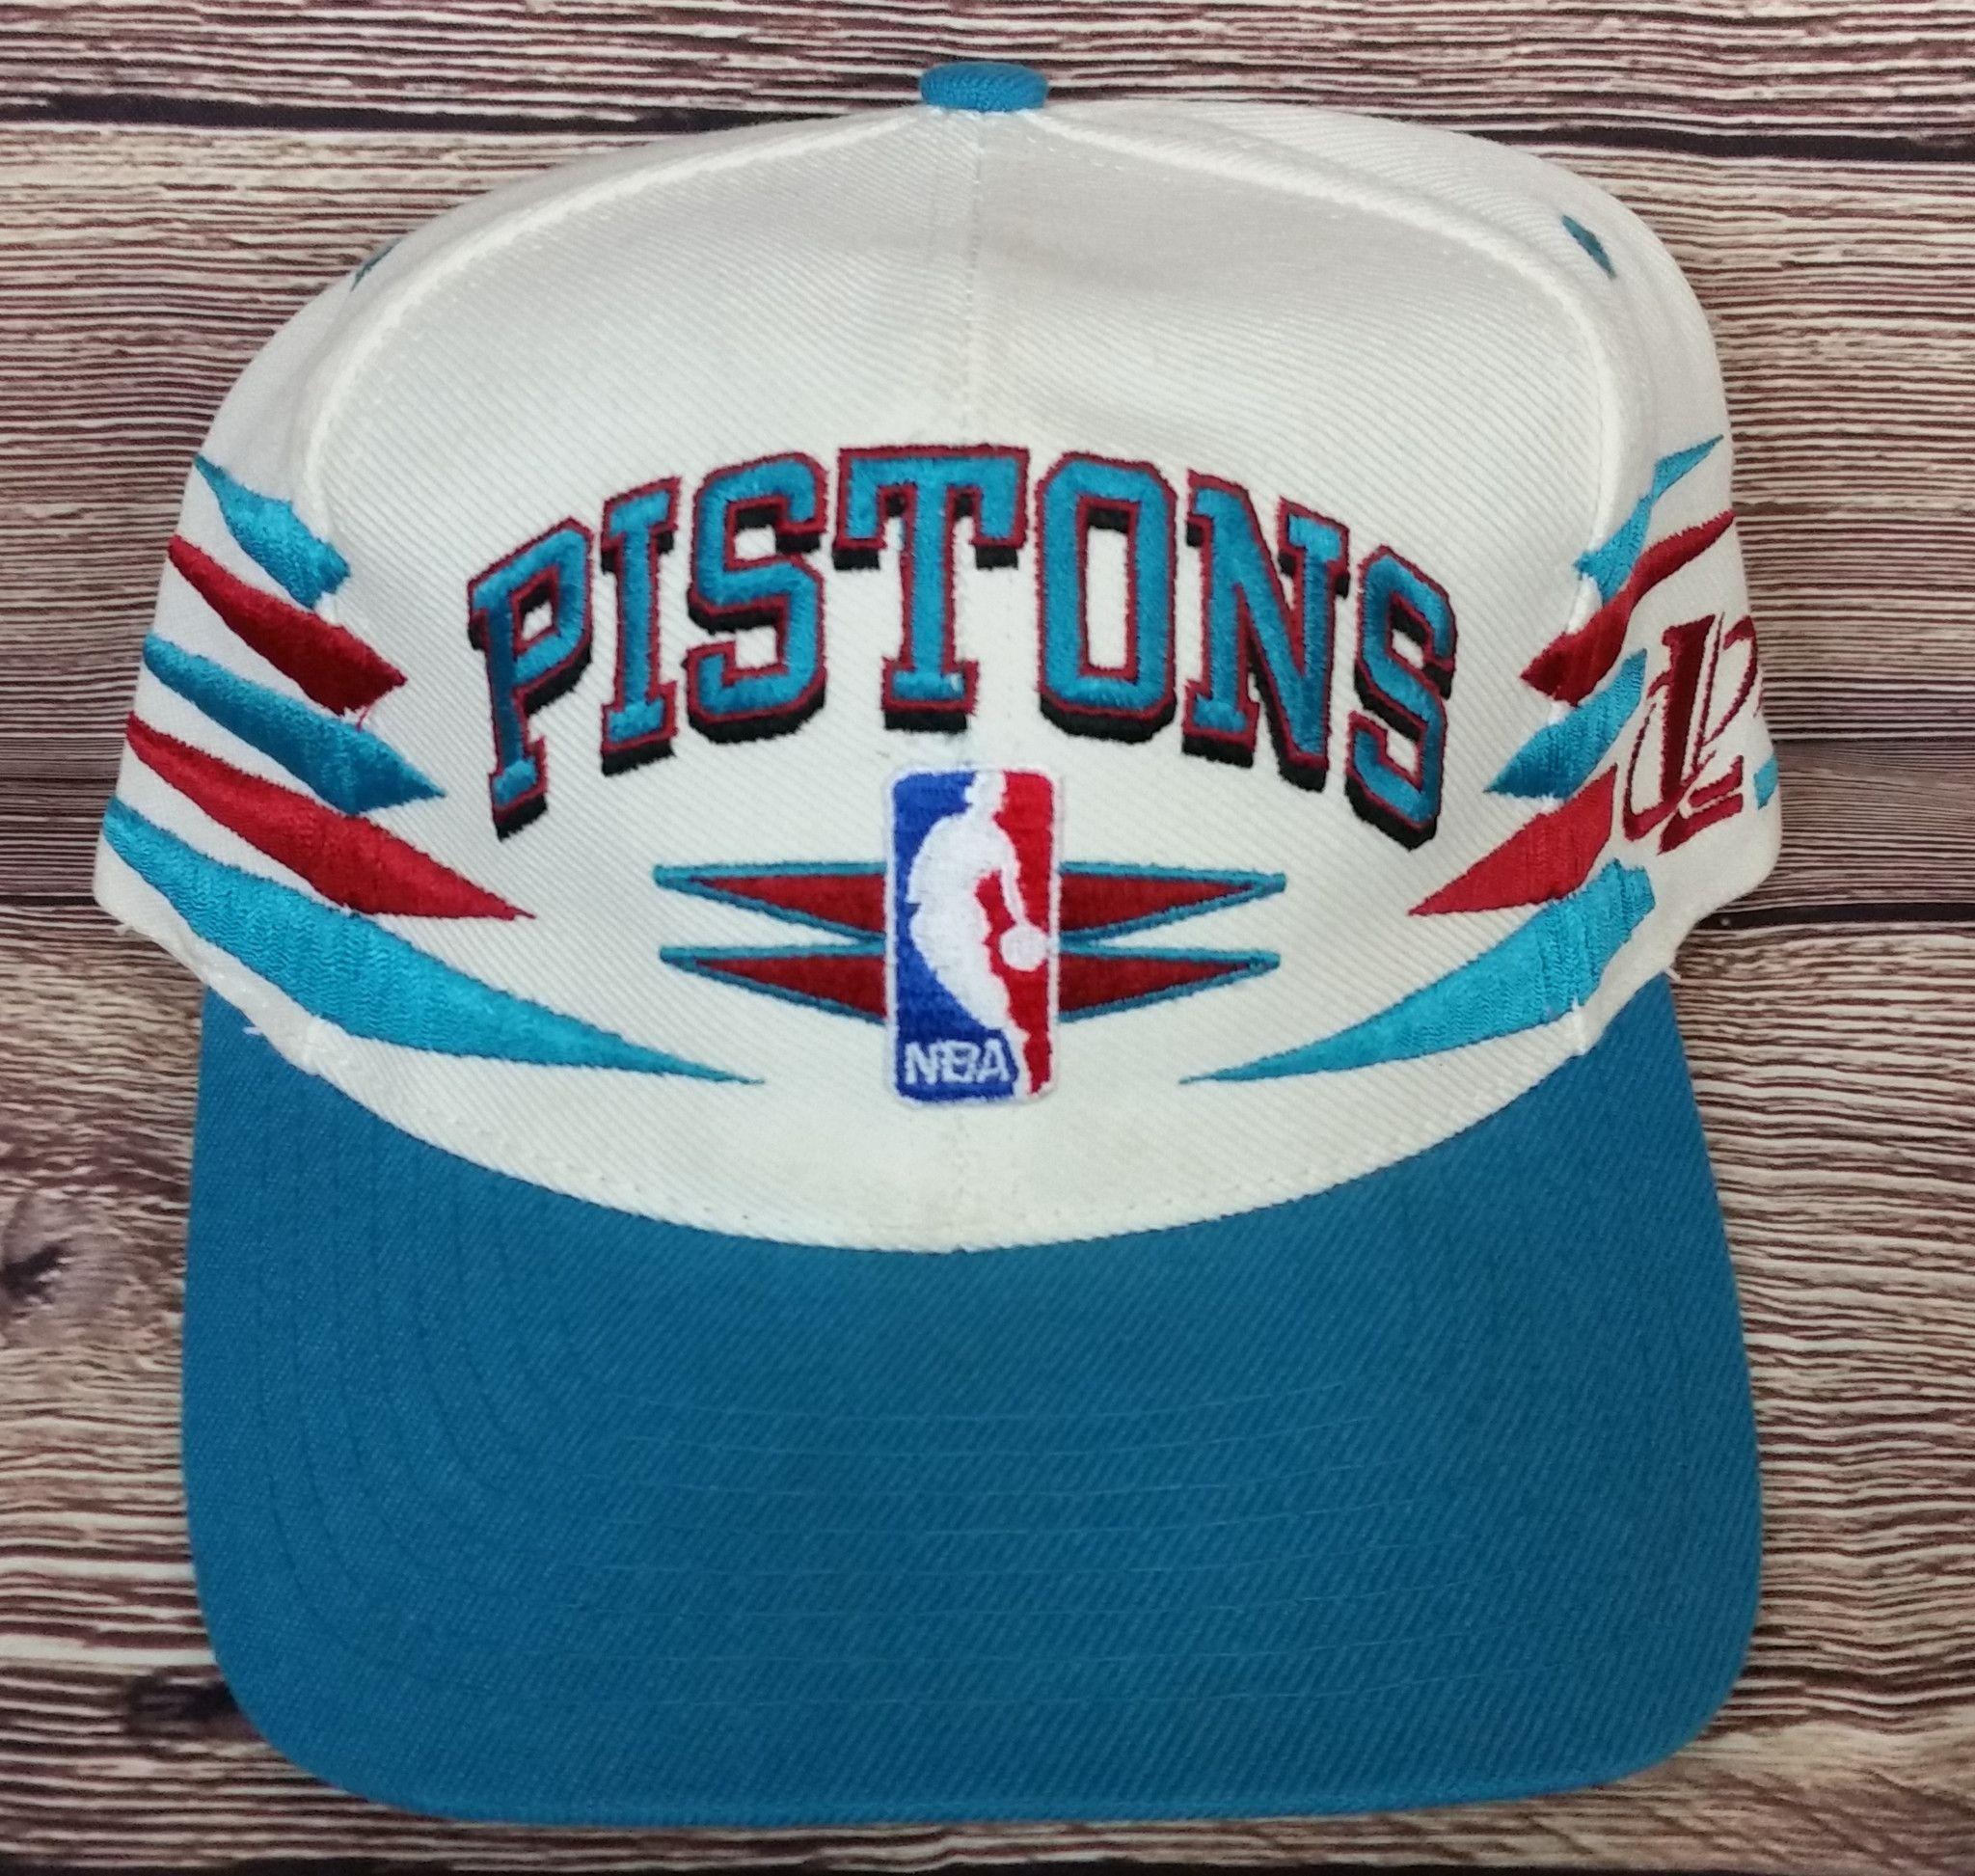 ac468407c6ee7 Detroit Pistons Vintage Snapback Logo Athletic Diamond Hat NBA Rare Cap  Starter